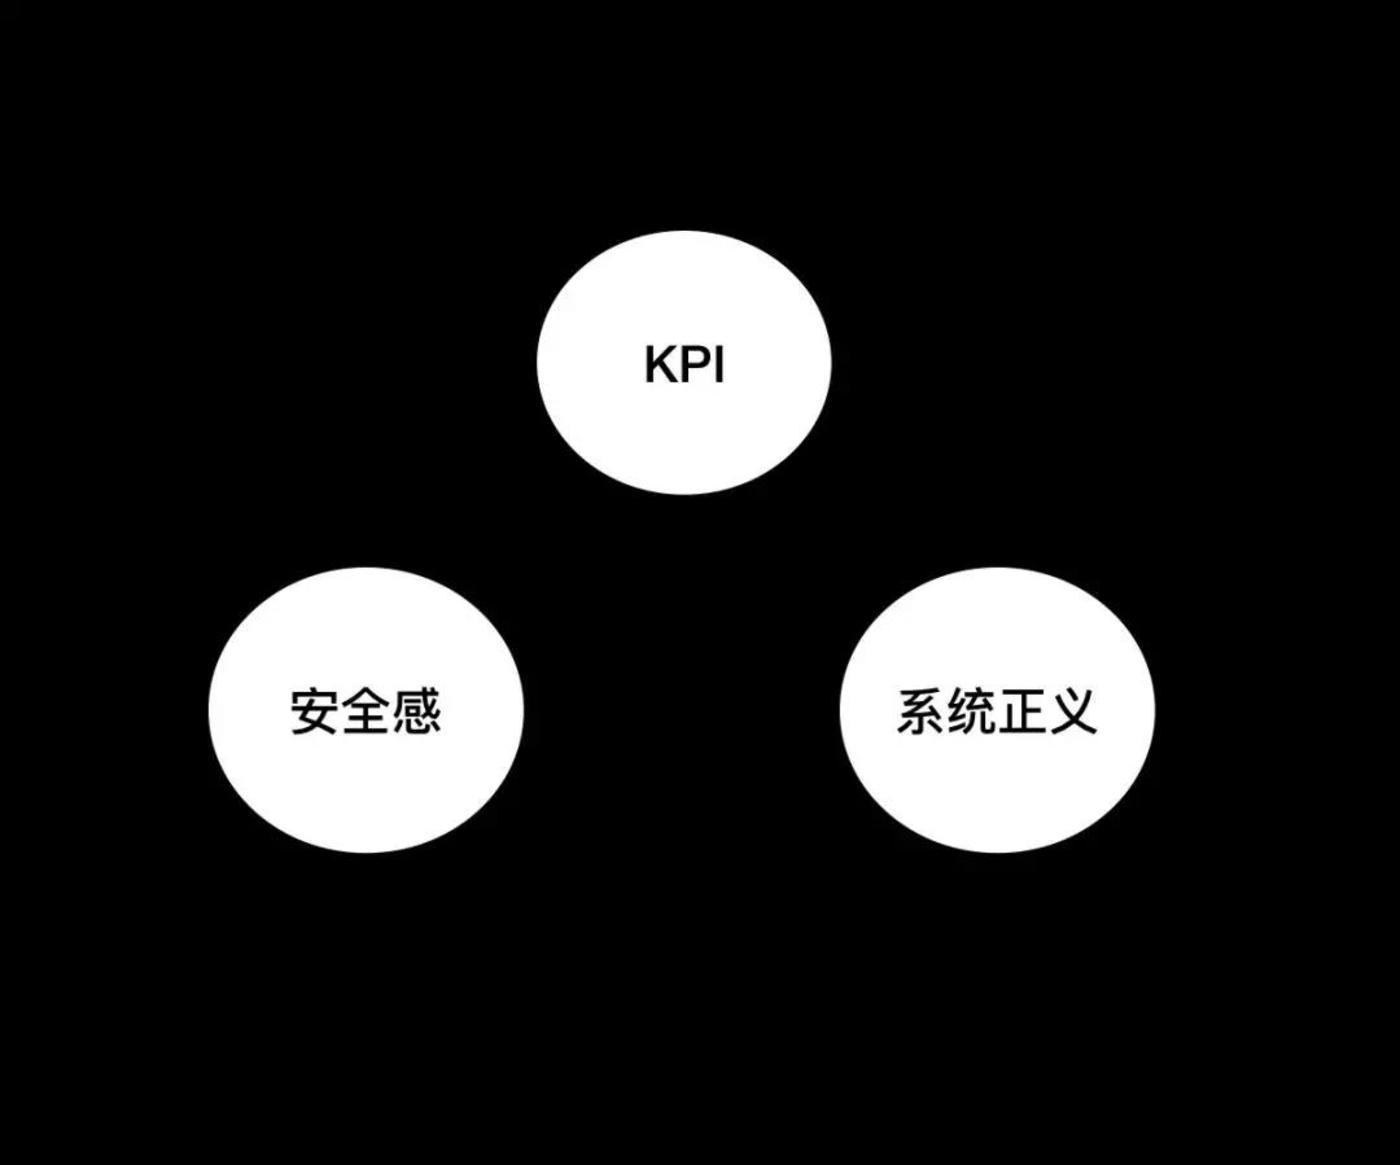 KPI、系统正义、员工安全感